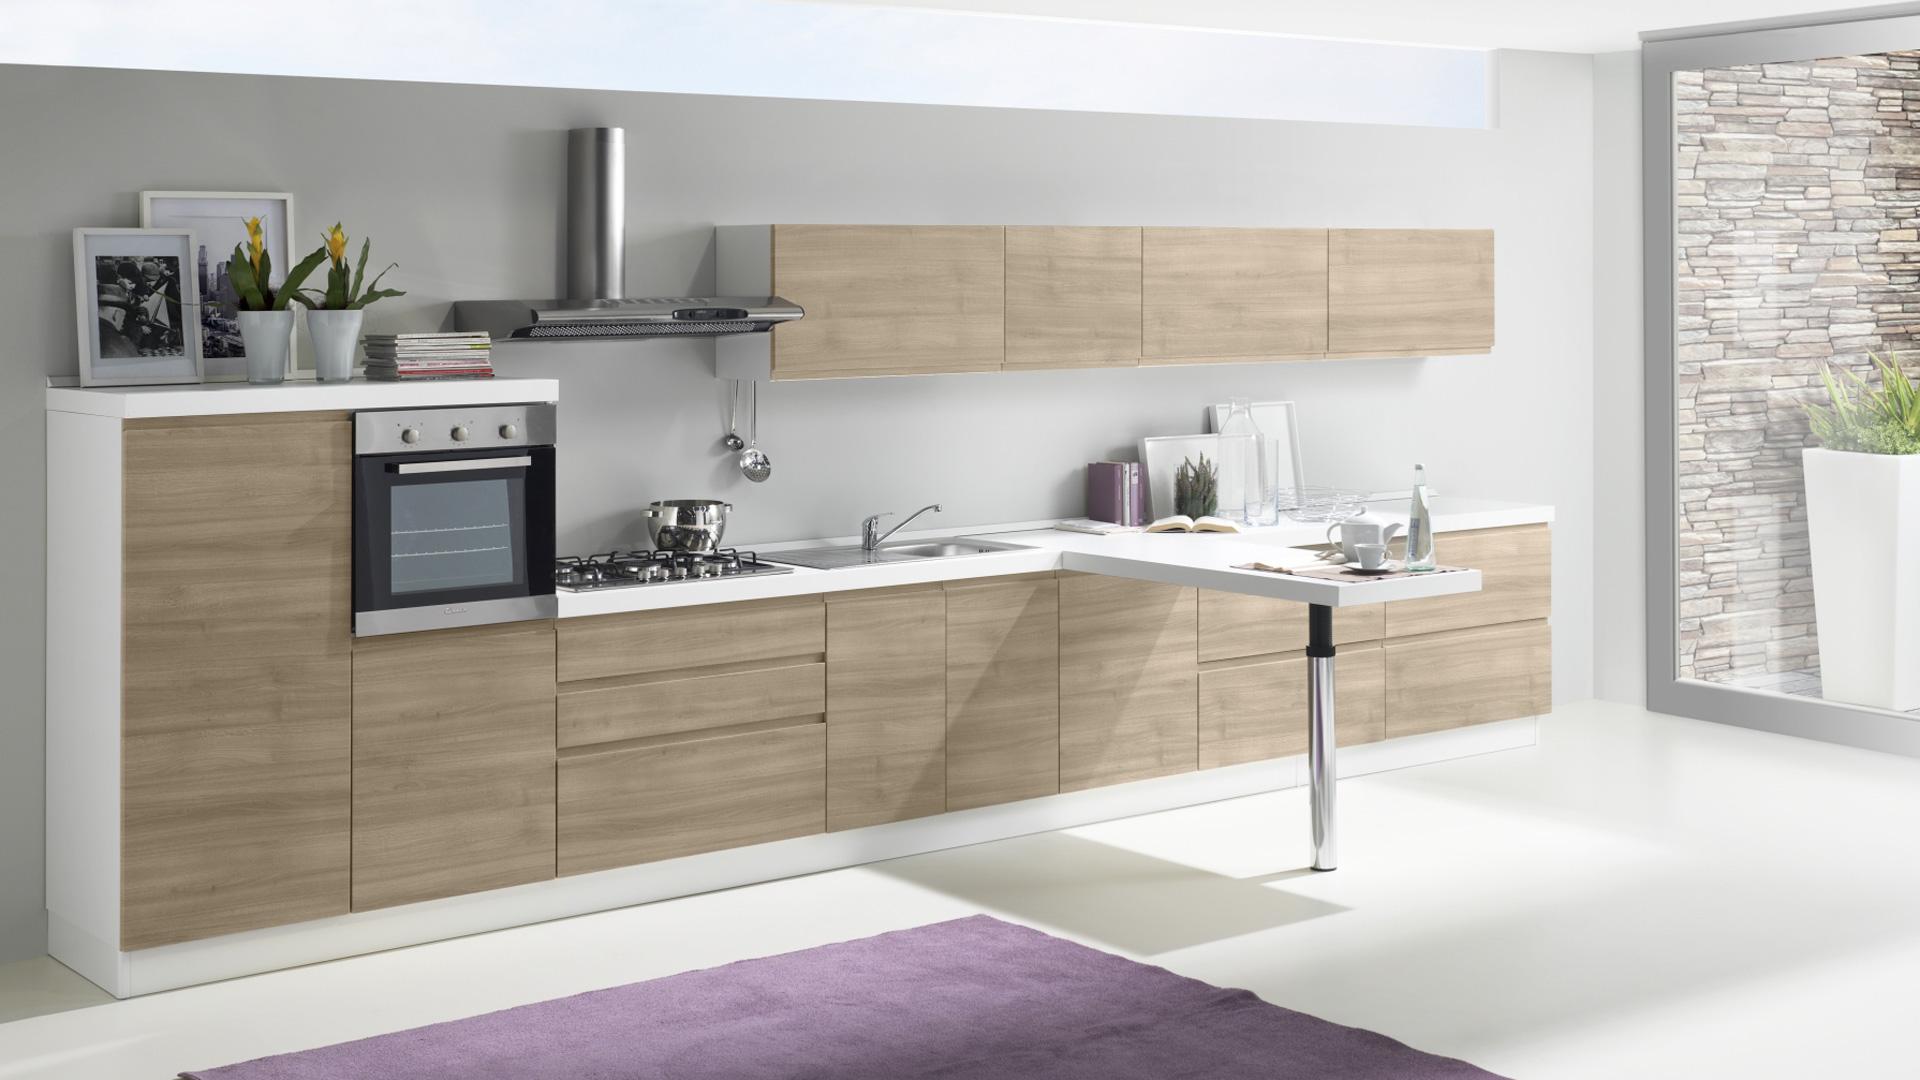 NETCUCINE Cucine Moderne KELLY - shop online su GranCasa